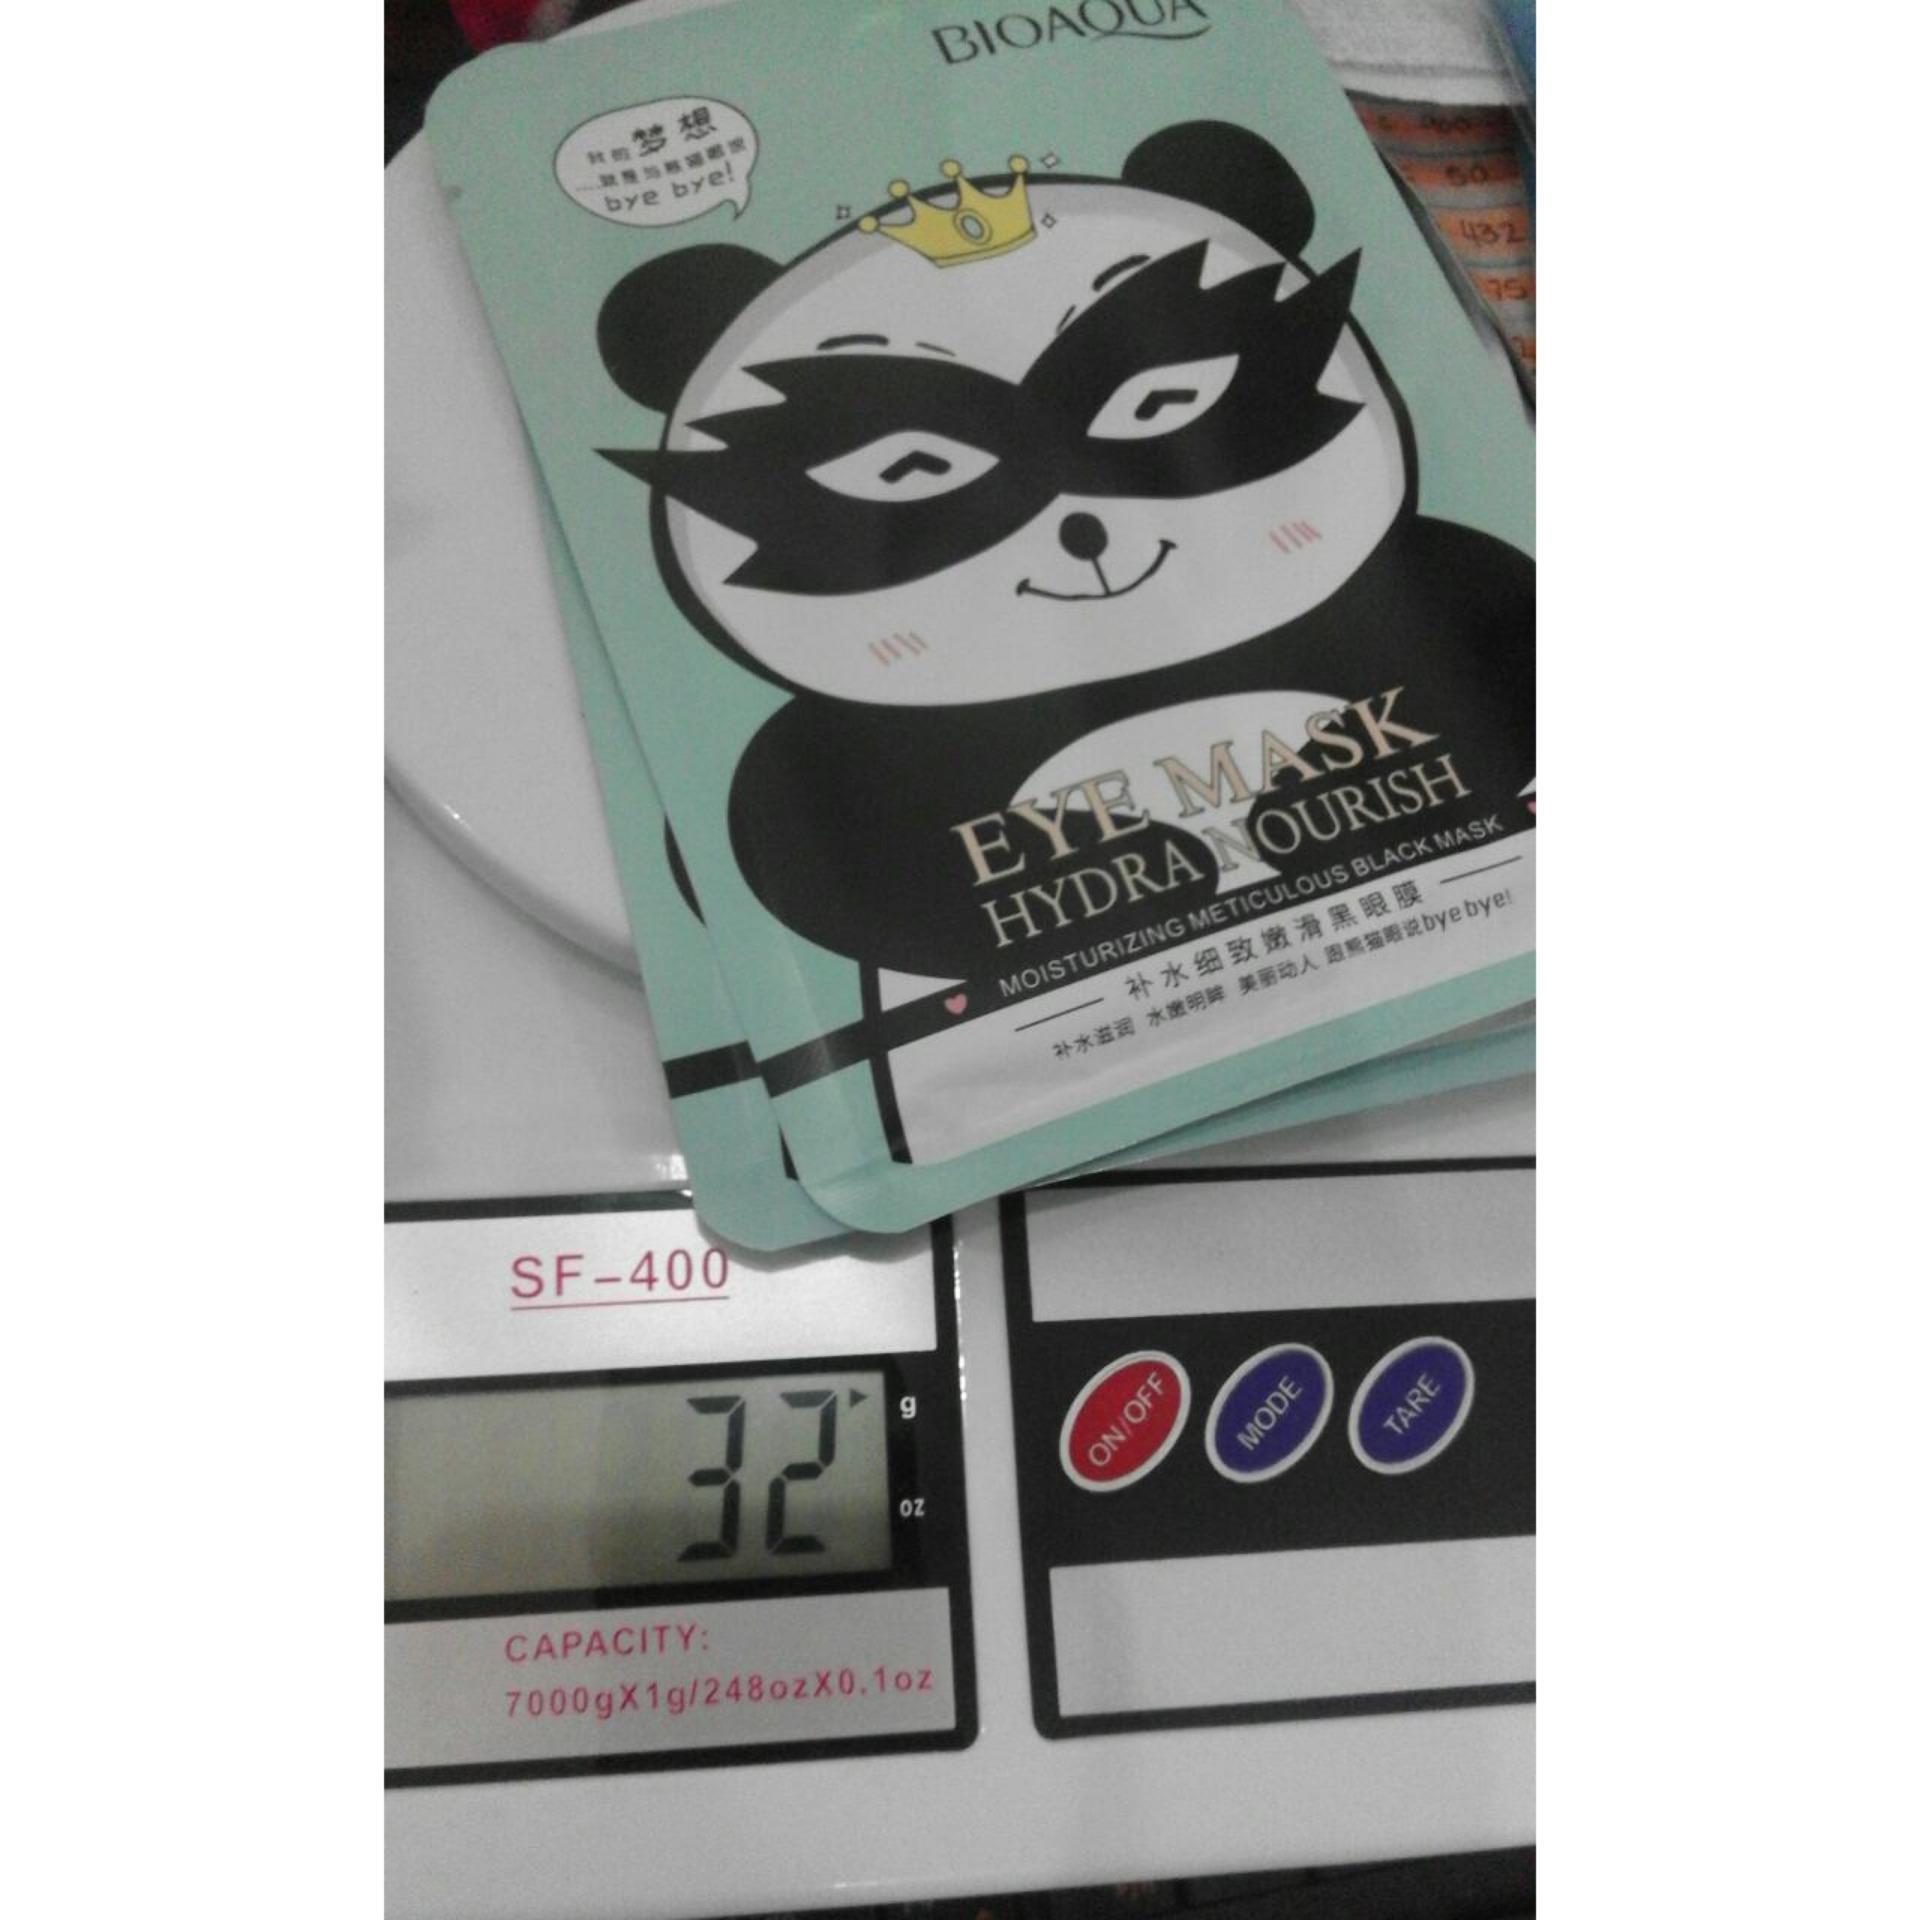 Philippines Bioaqua Bamboo Charcoal Anti Wrinkle Moisturizing Masker Collagen Blackeye Mask Buy 1 Take